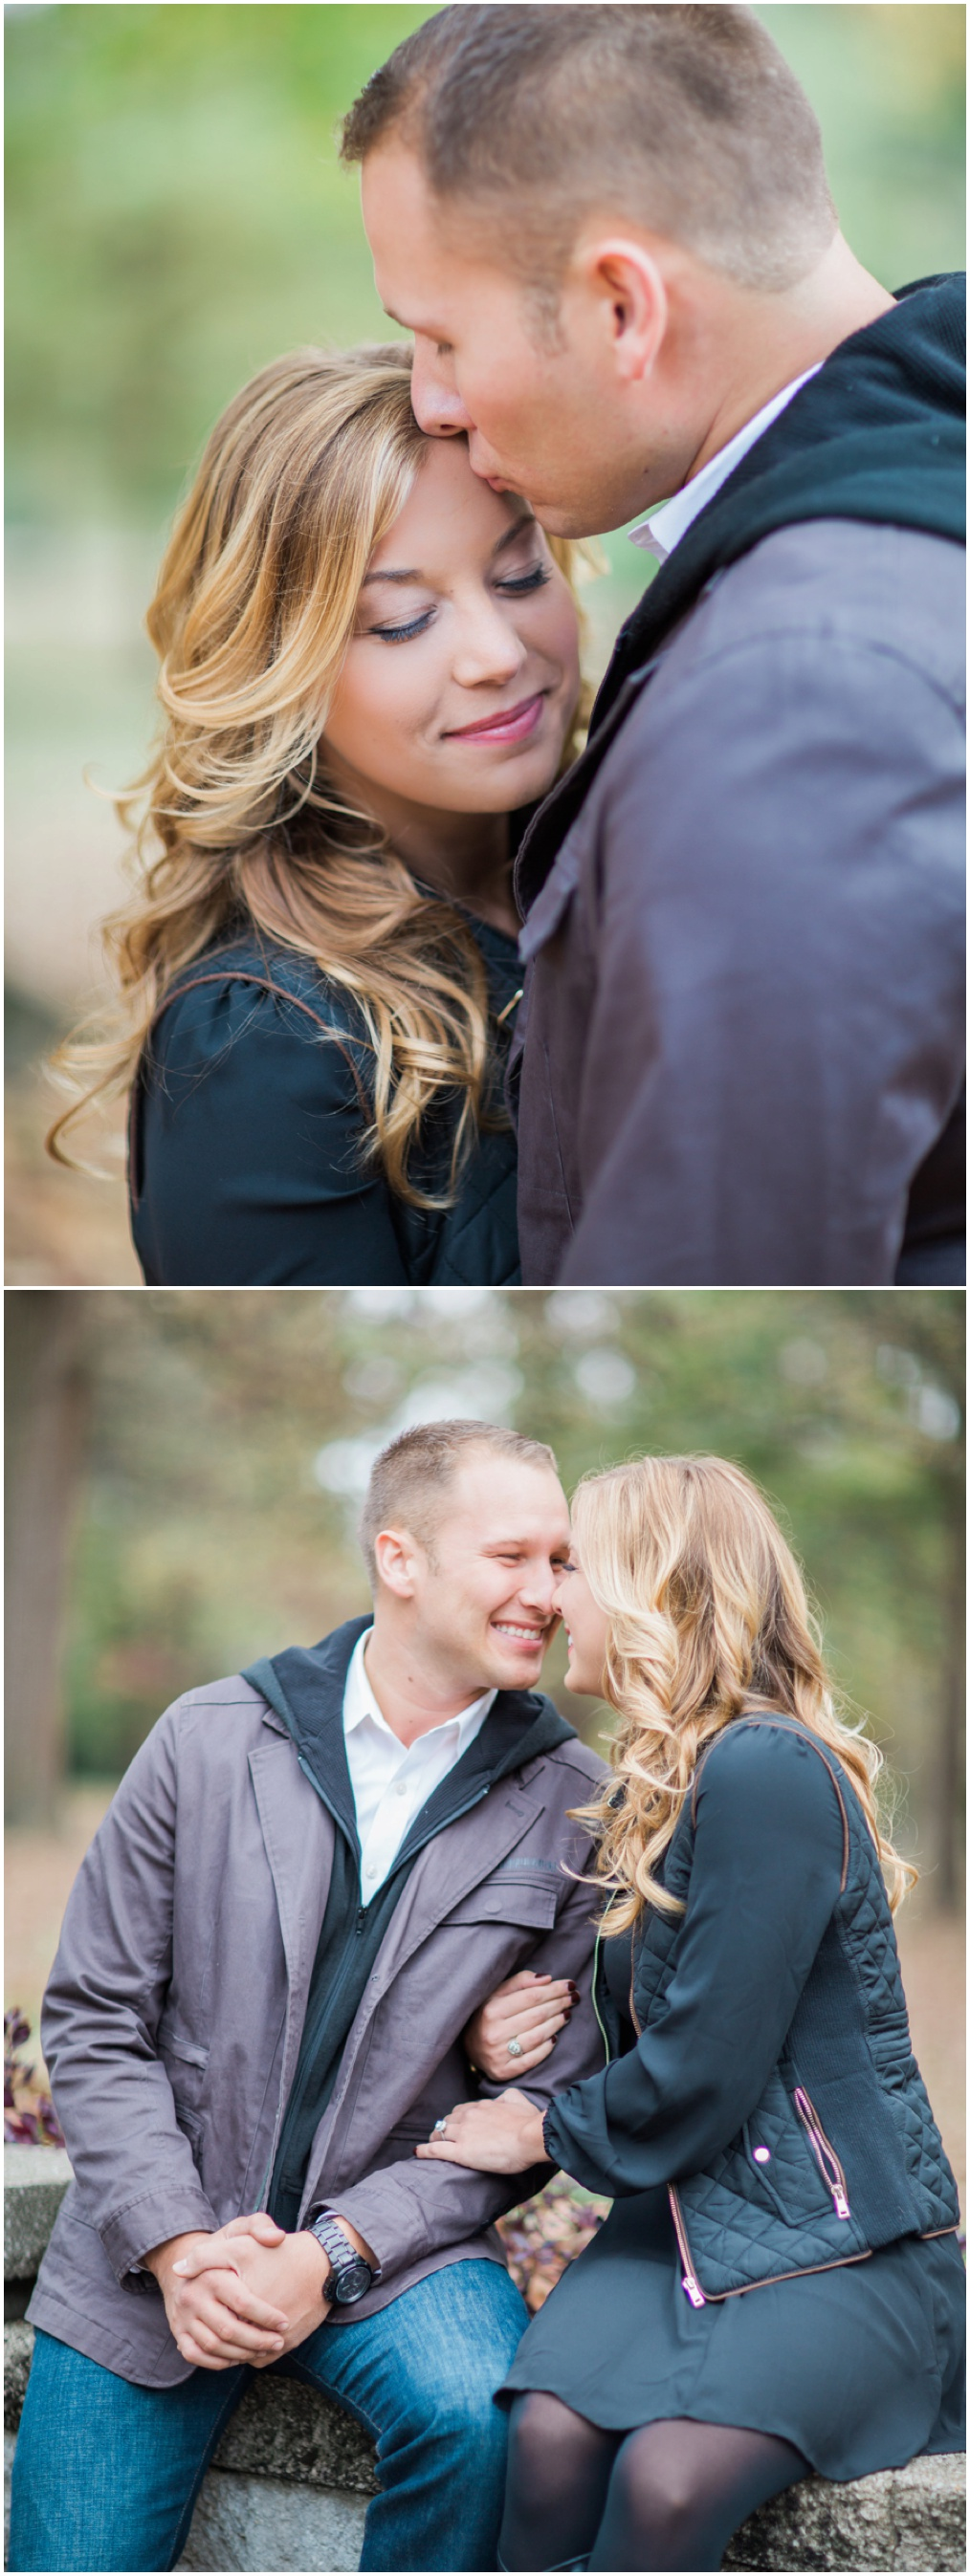 wedding-engagement-photographer.jpg